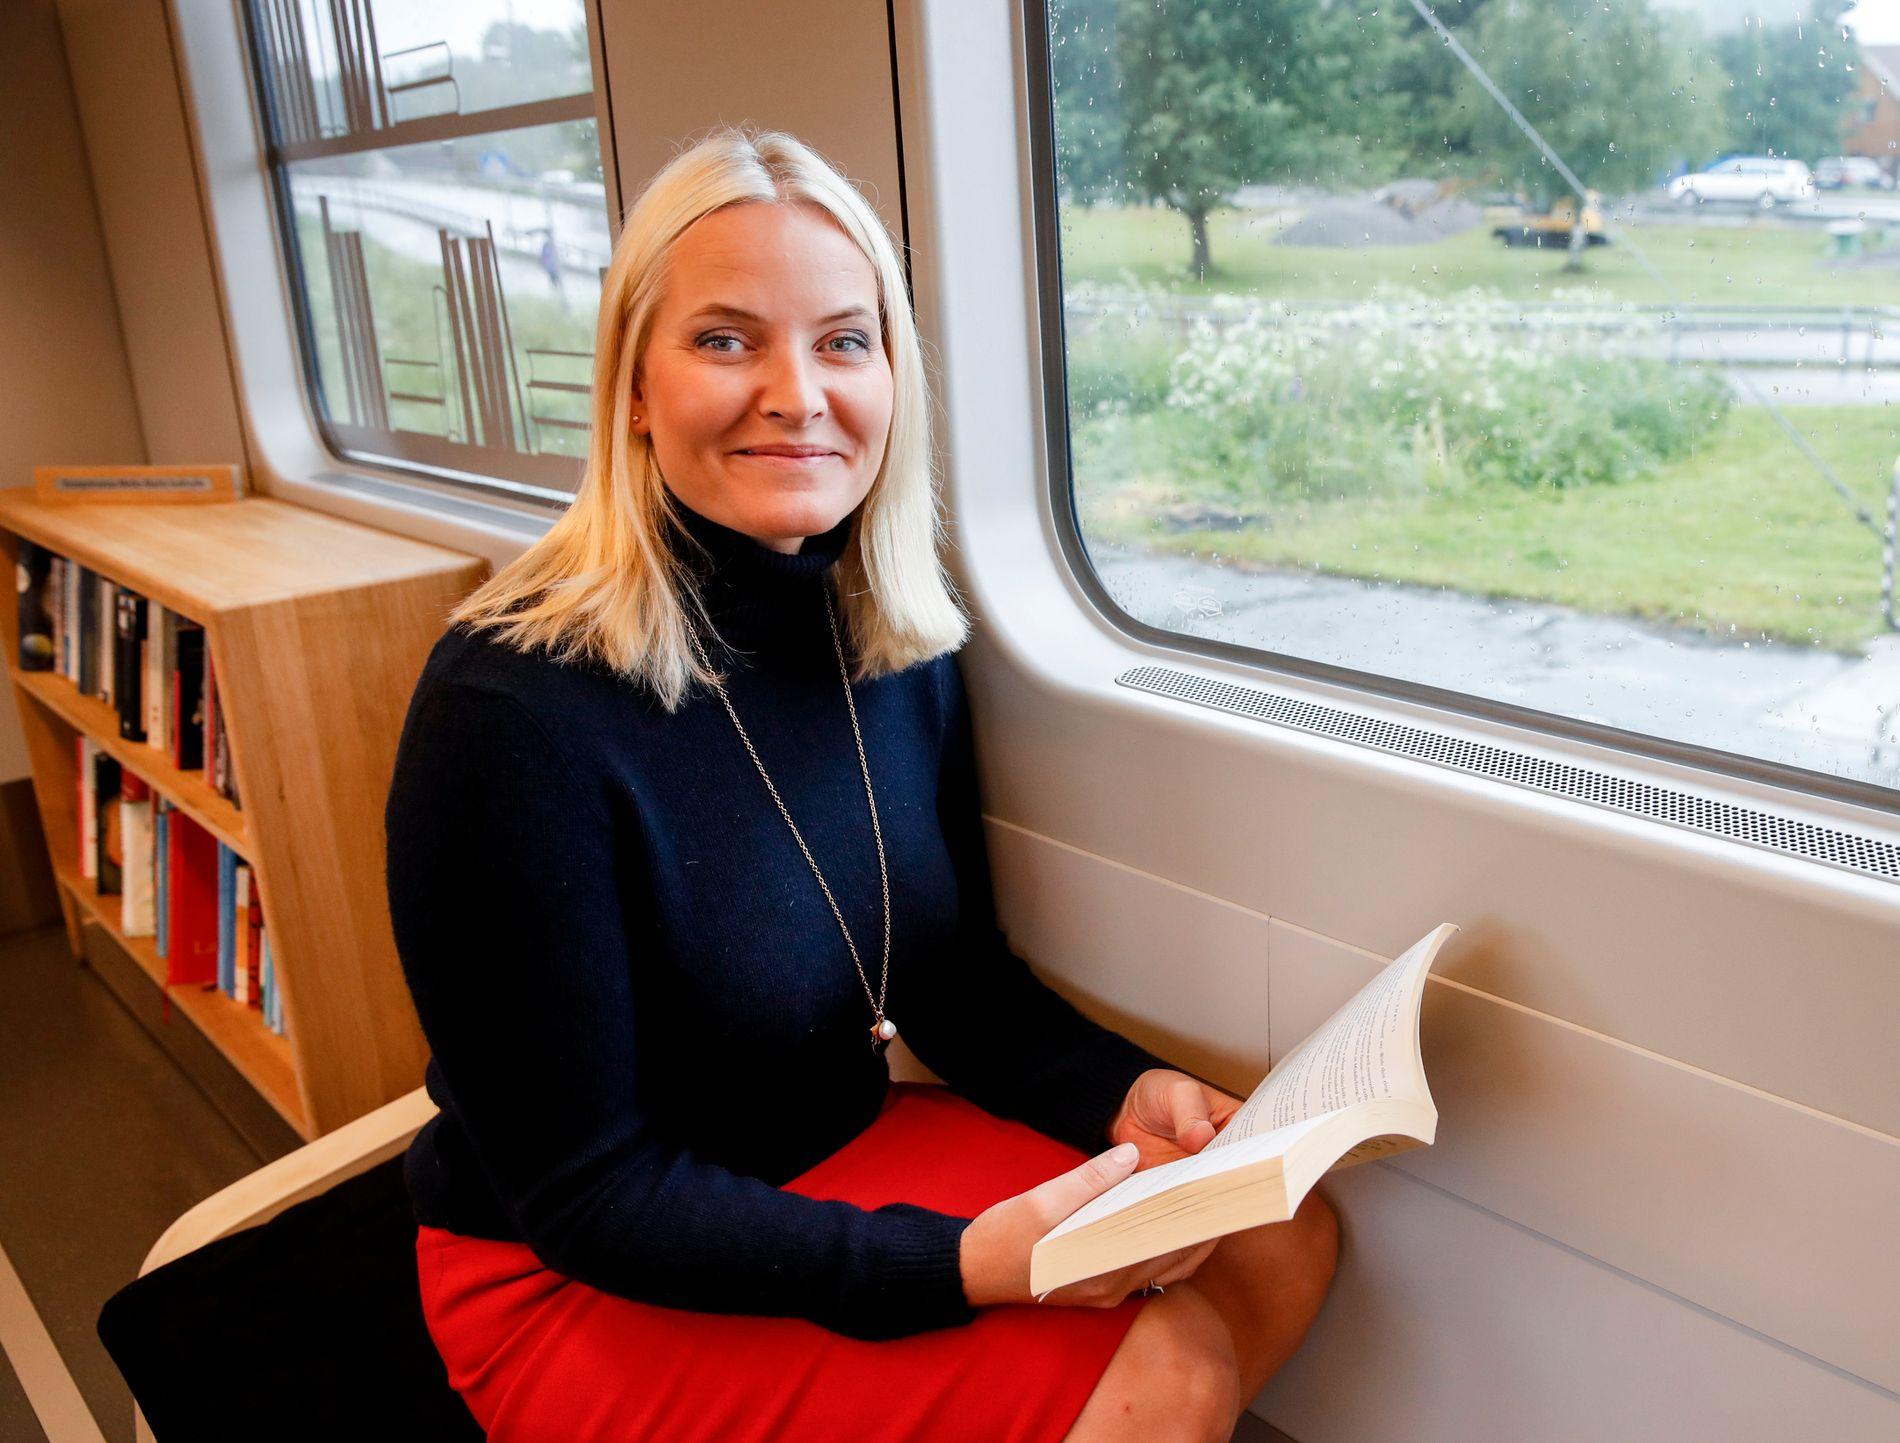 TYSK LITTERATURTOG: Kronprinsesse Mette-Marit tar med seg kjente norske forfattere på litteraturtog i Tyskland før bokmessen i Frankfurt der Norge i år er hovedland.